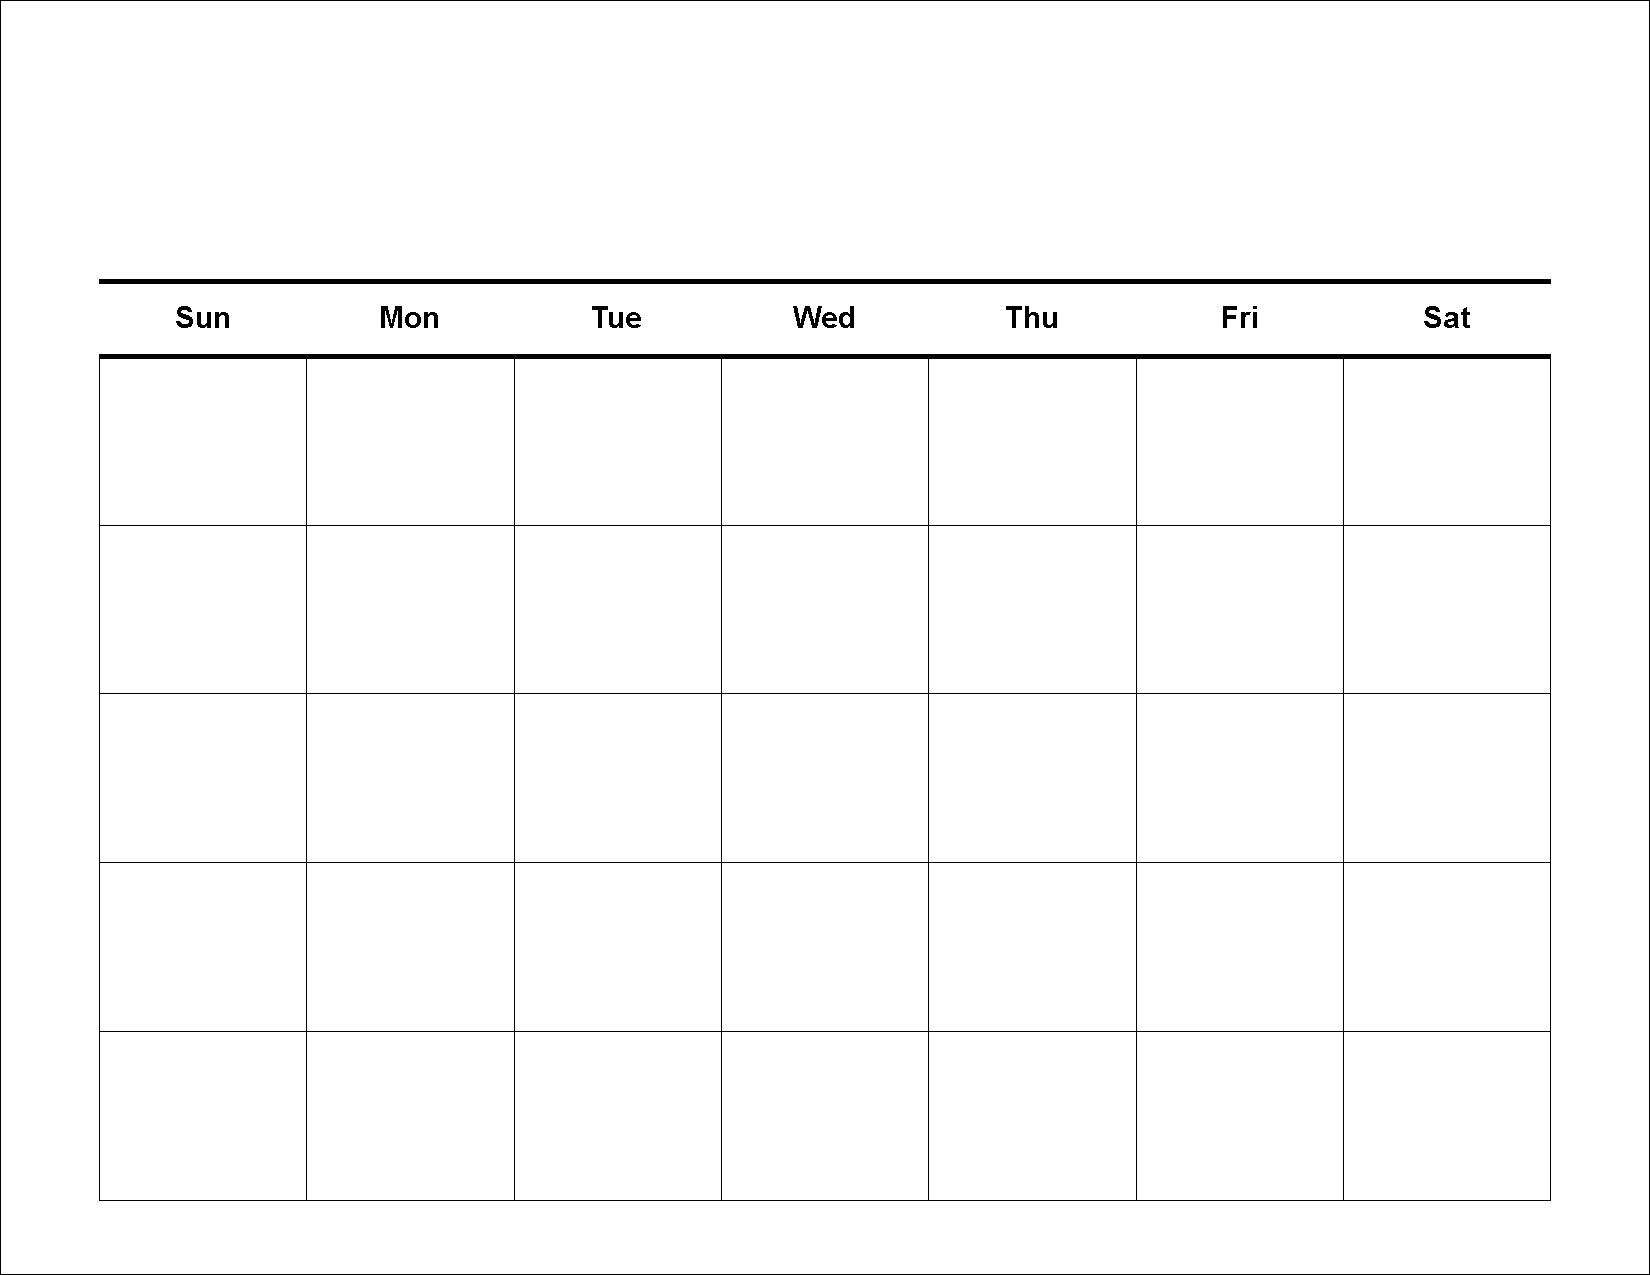 30-Day-Calendar-Template-Printable-Large throughout Free Printable 30 Day Calendars